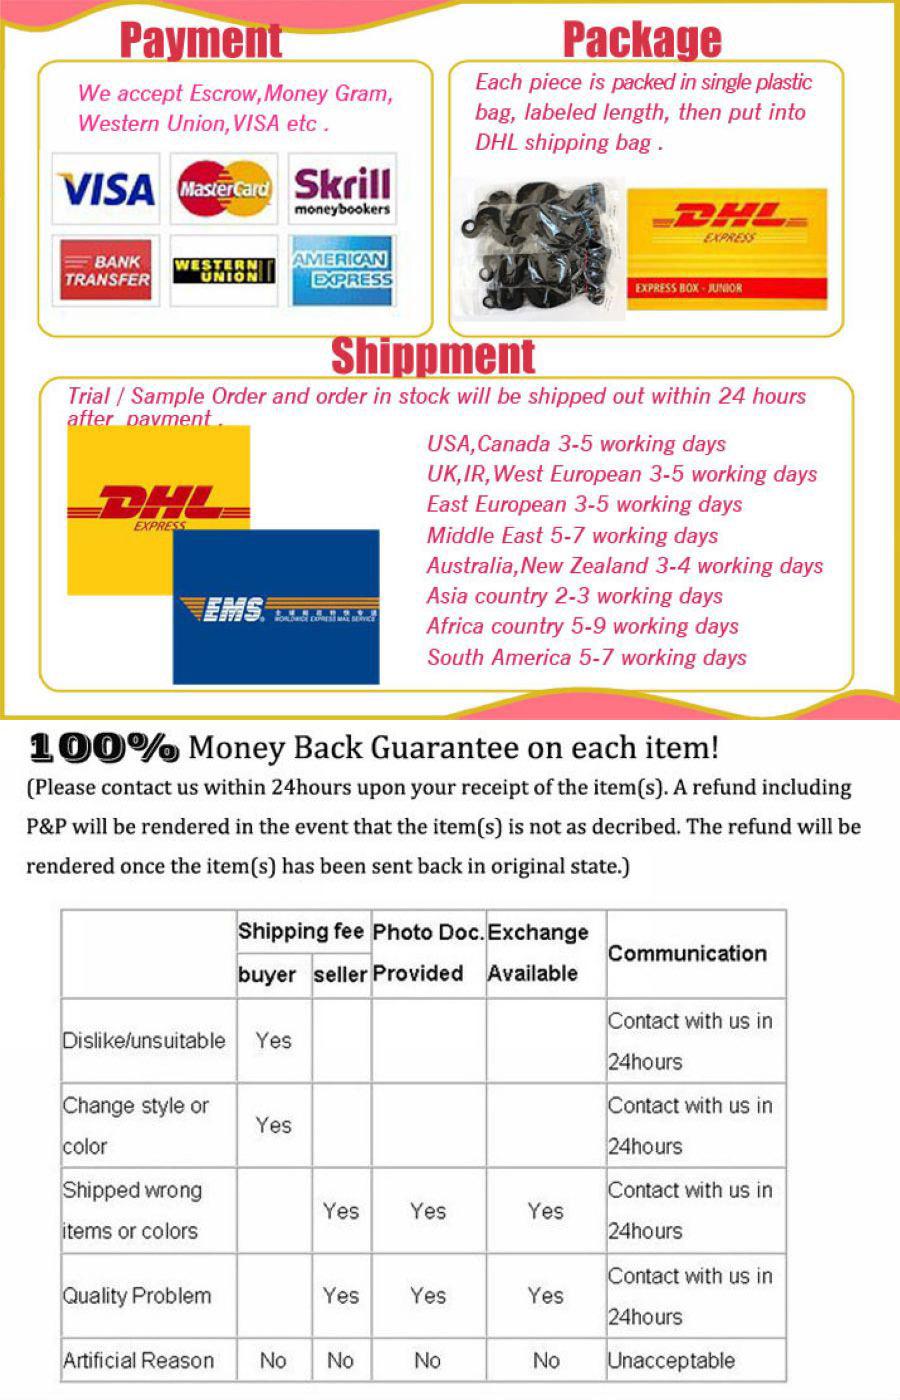 Shipping & Return.jpg